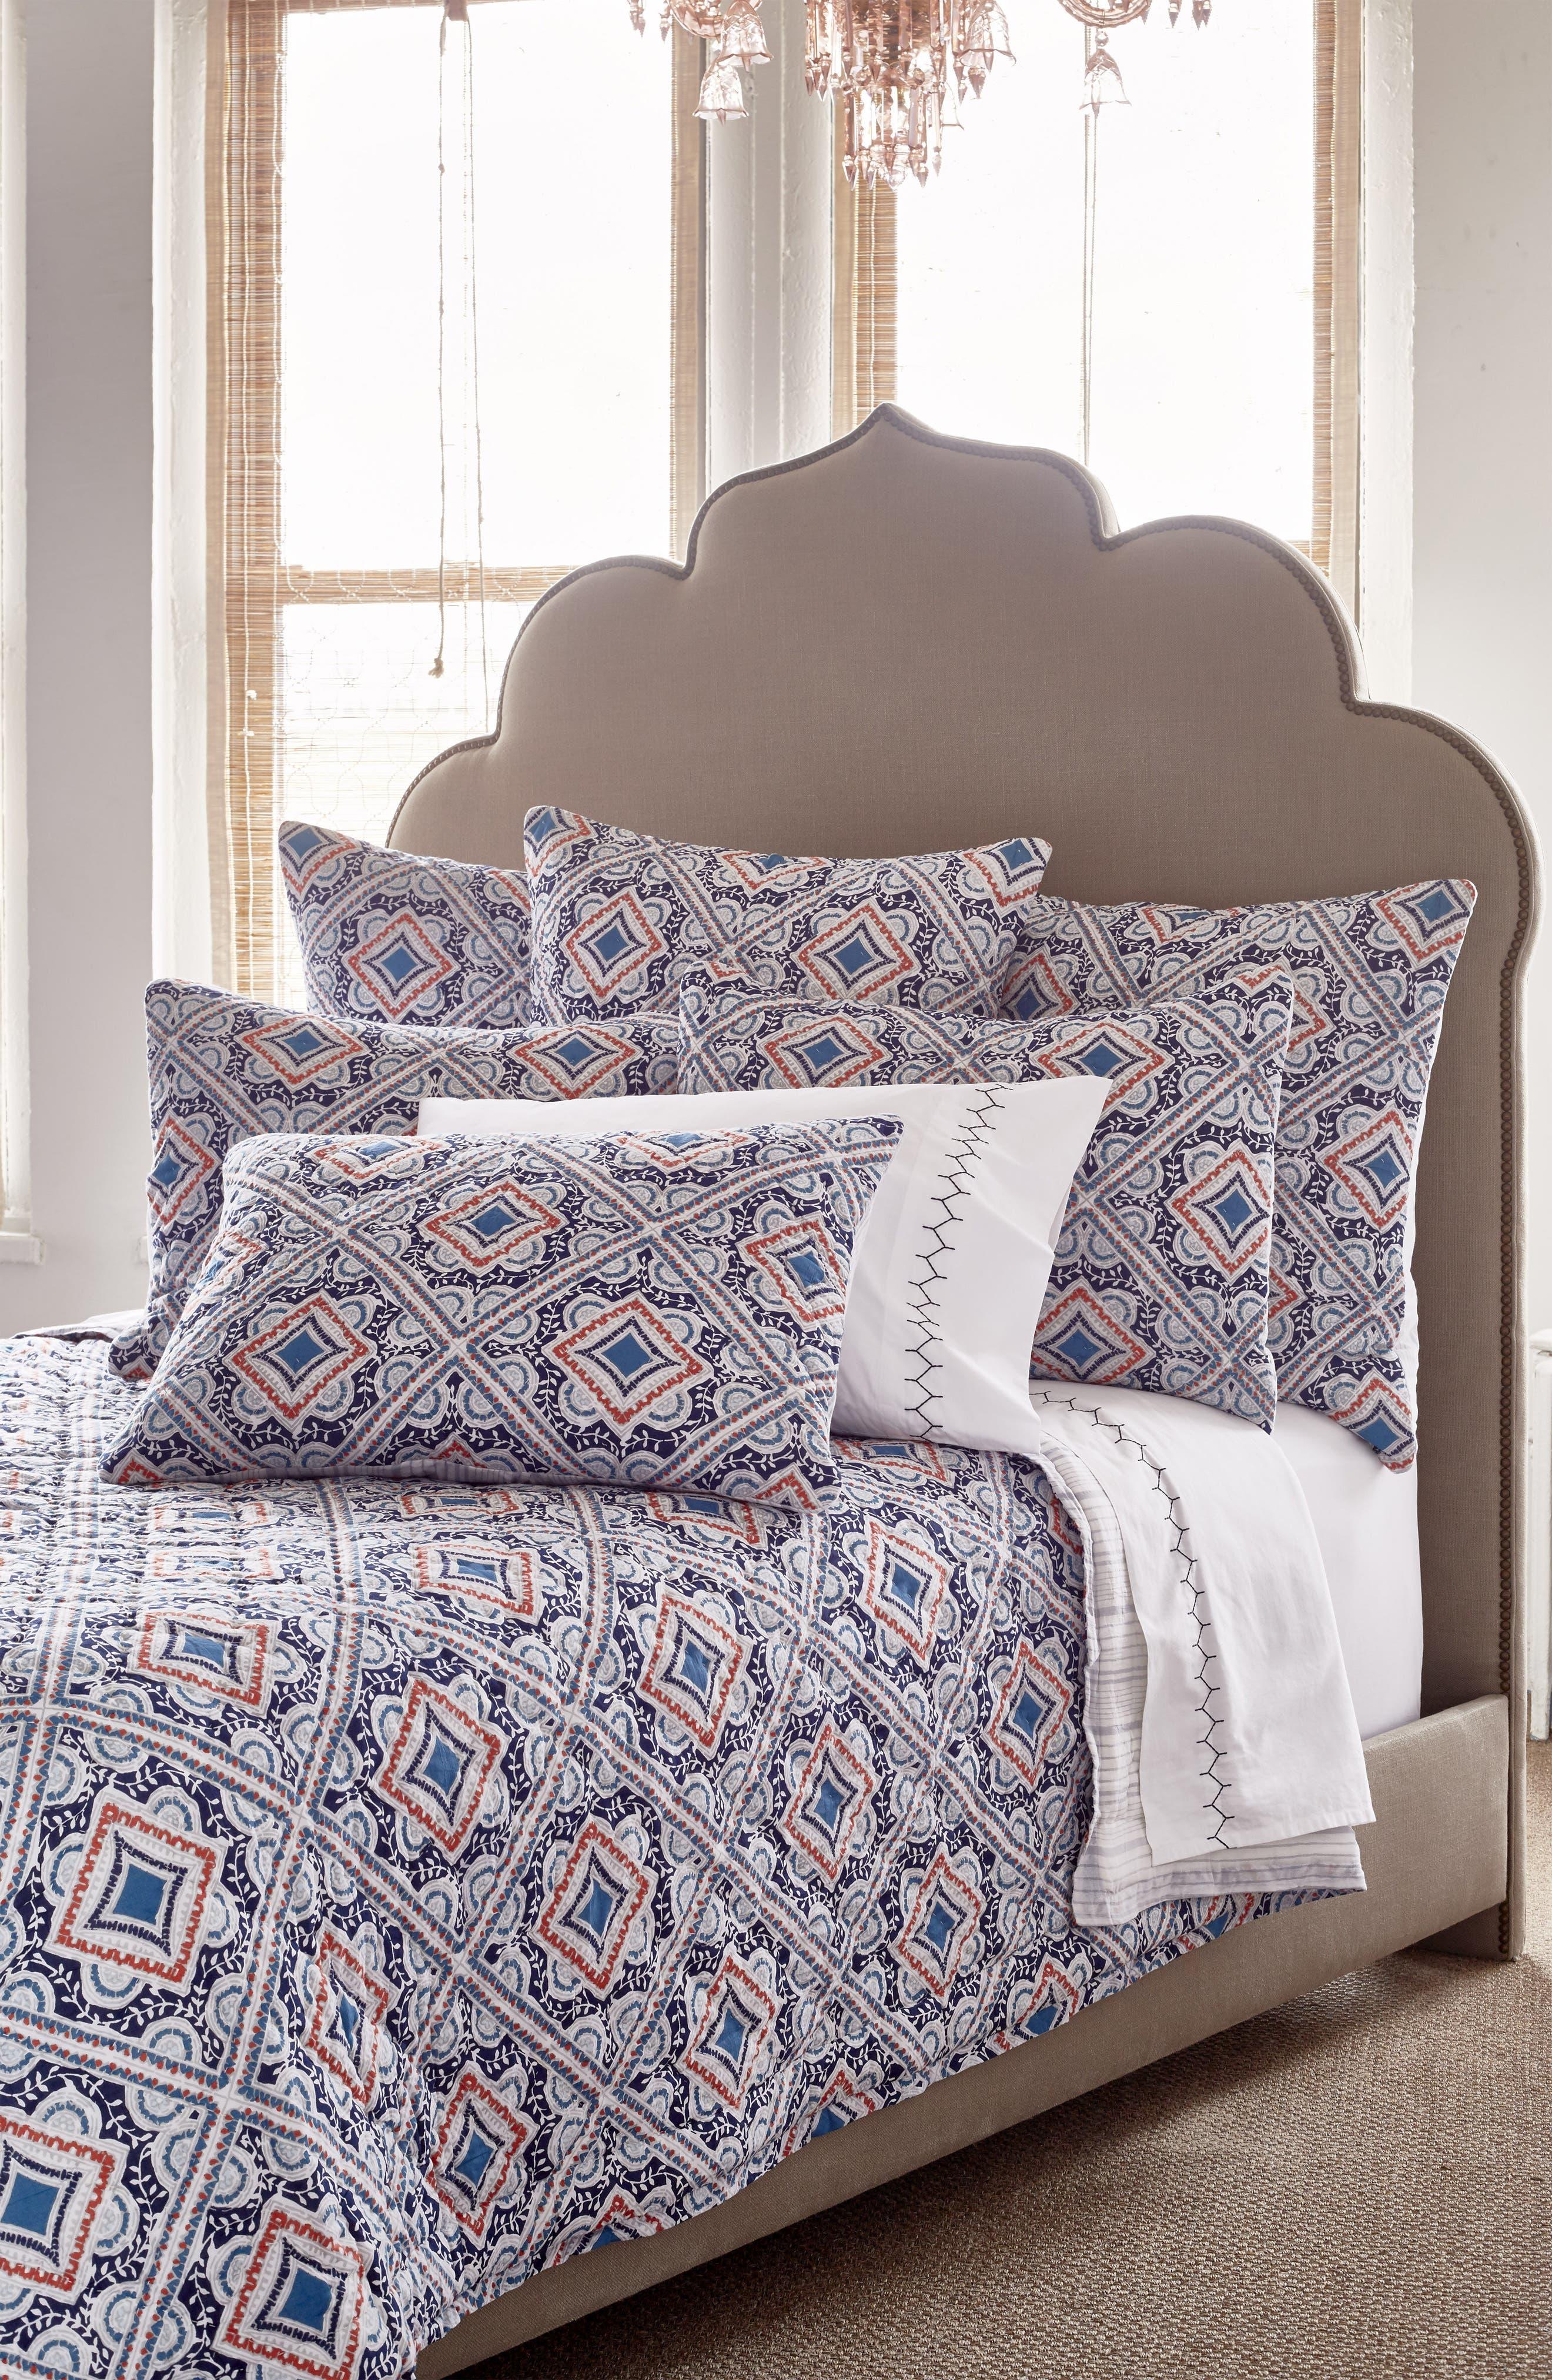 robshaw waites bag bed floral sets in grey john pillows beautiful bedding marshalls cynthia koltes rowley lovely nancy bohemian raymond of a